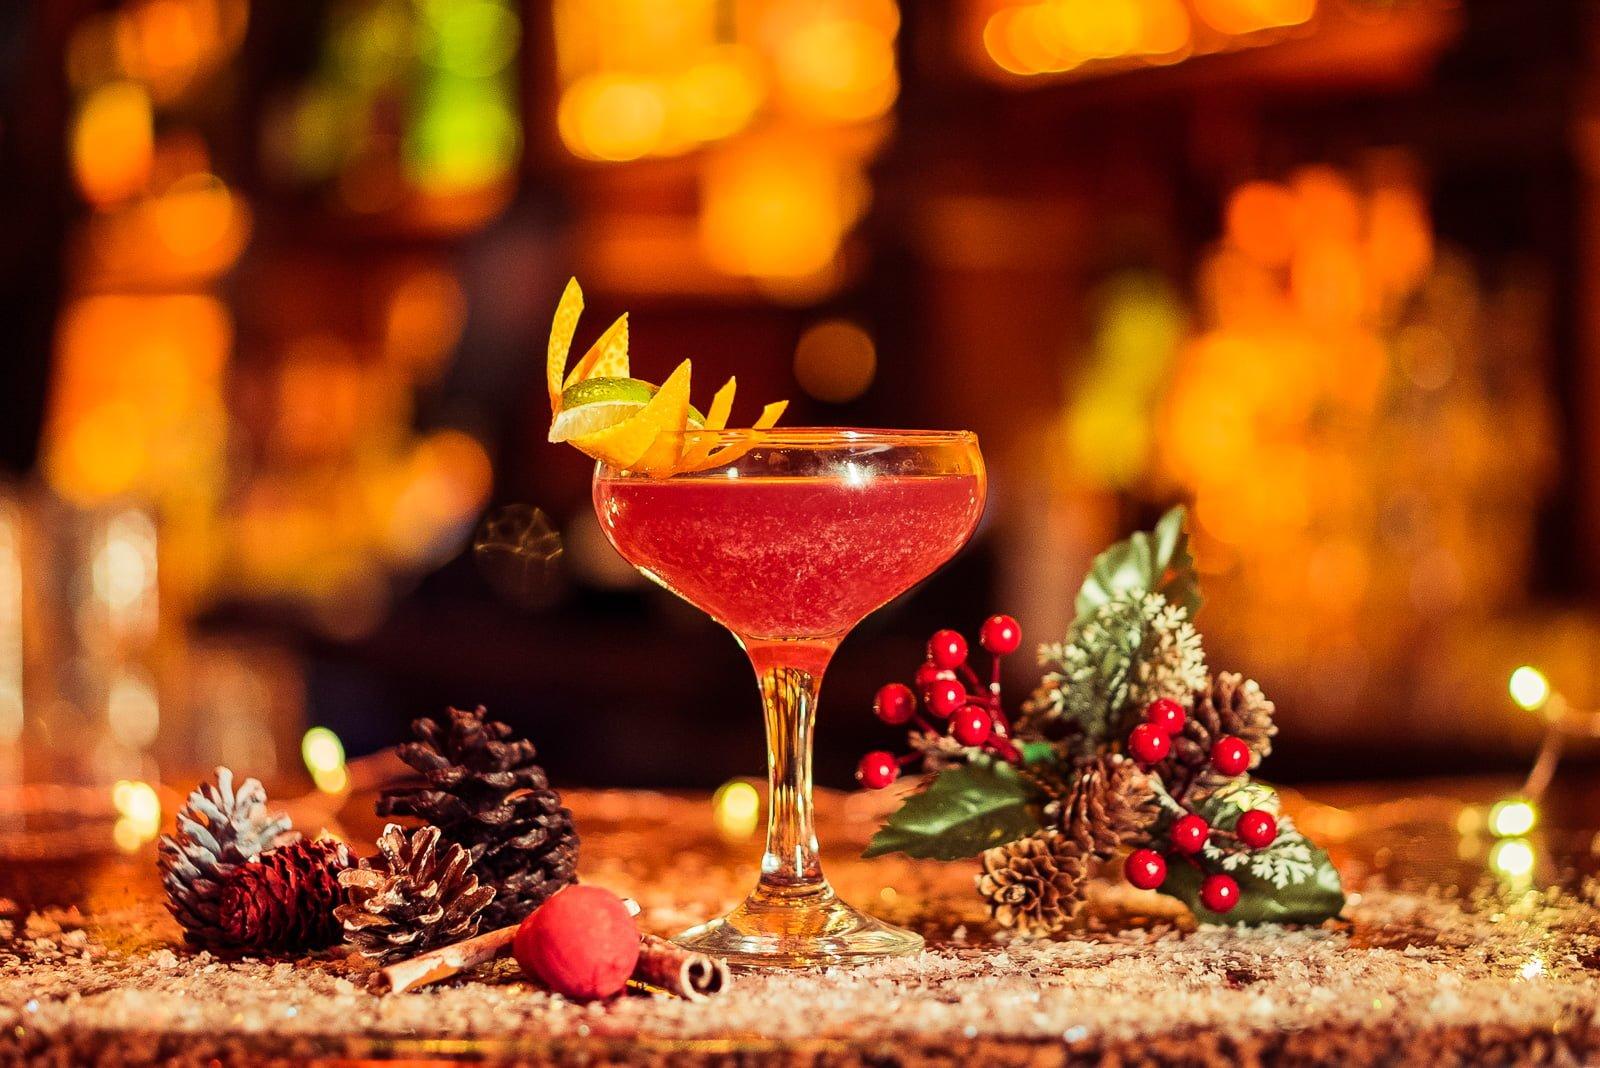 Christmas Liquor.The Liquor Lounge Christmas Cocktails The Dail Bar